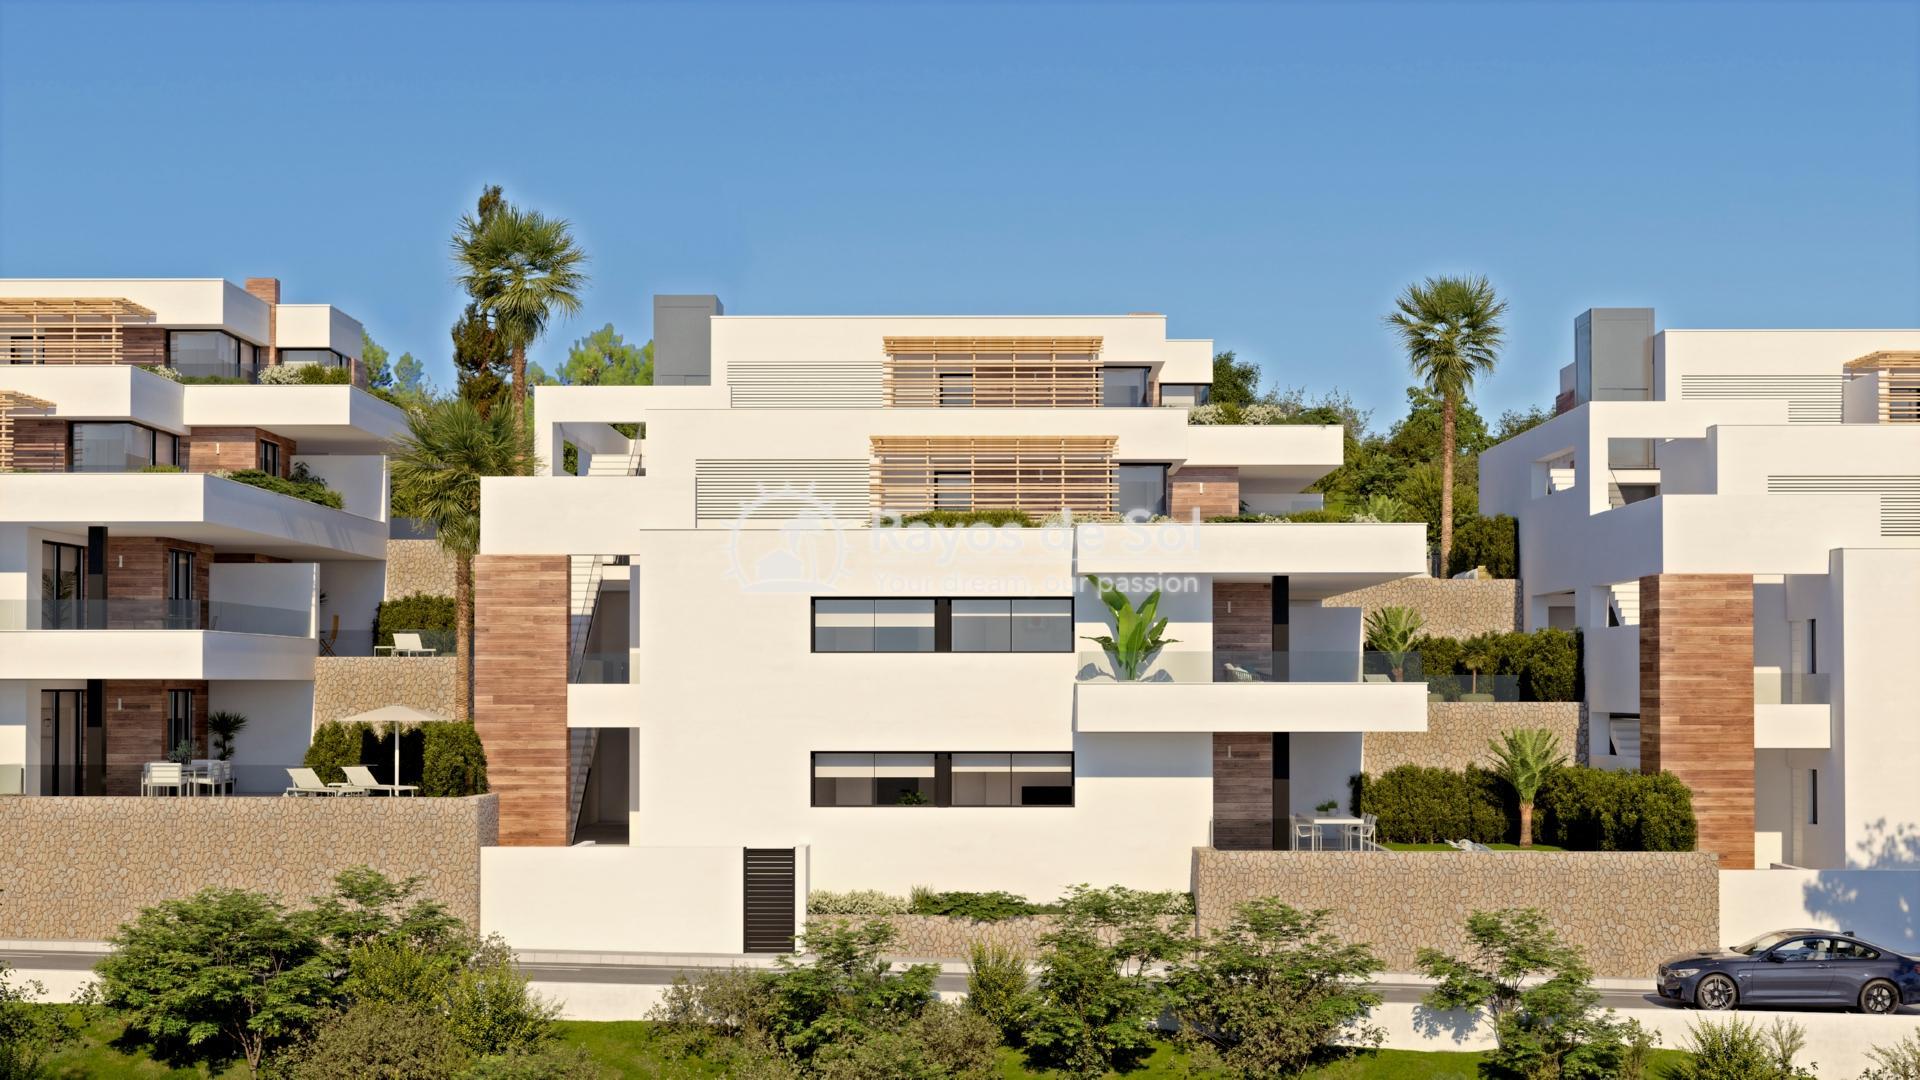 Apartment in Cumbre del Sol, Benitachell, Costa Blanca (ov-ph003) - 3